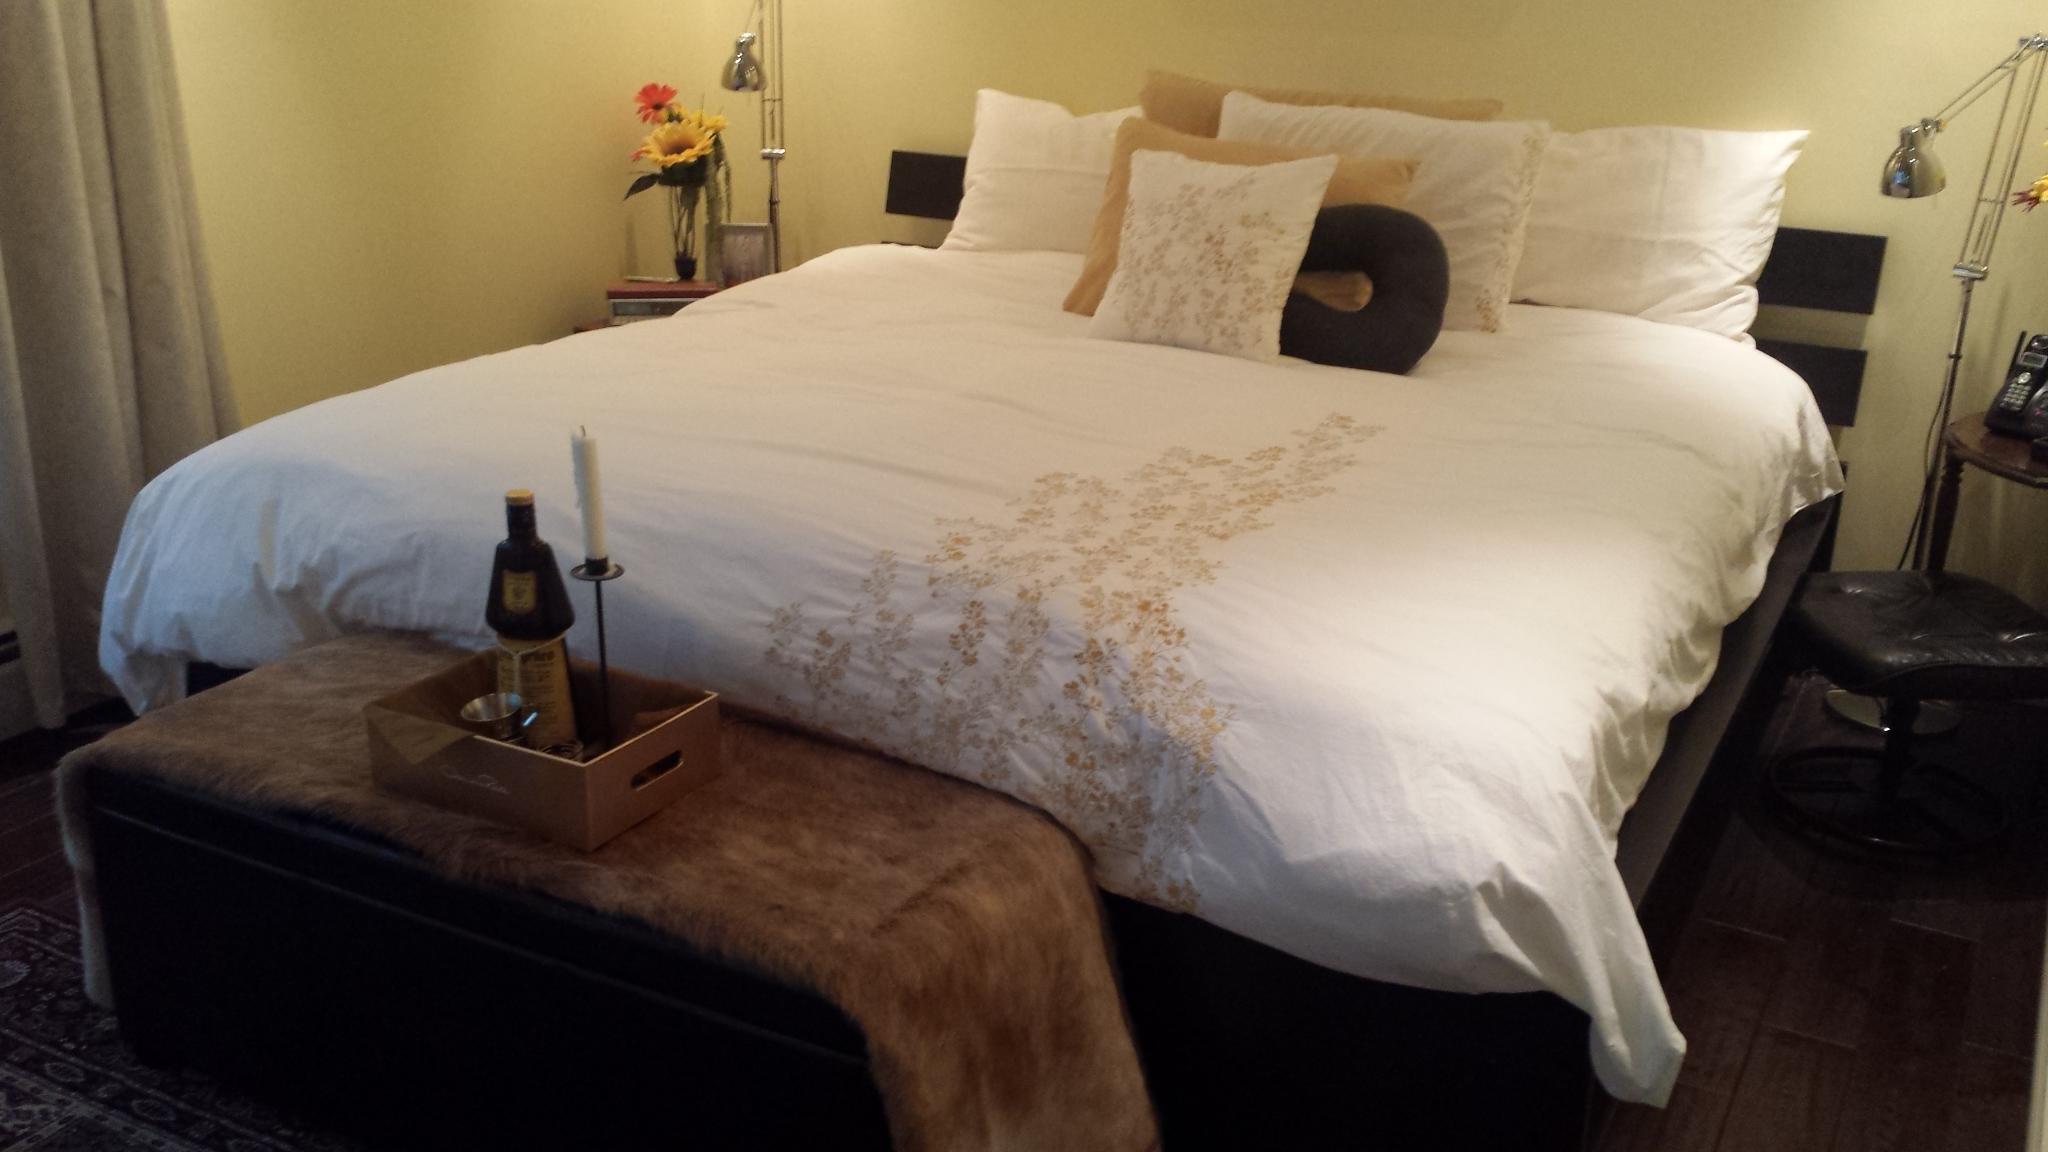 Unit 204 - Master Bedroom 2